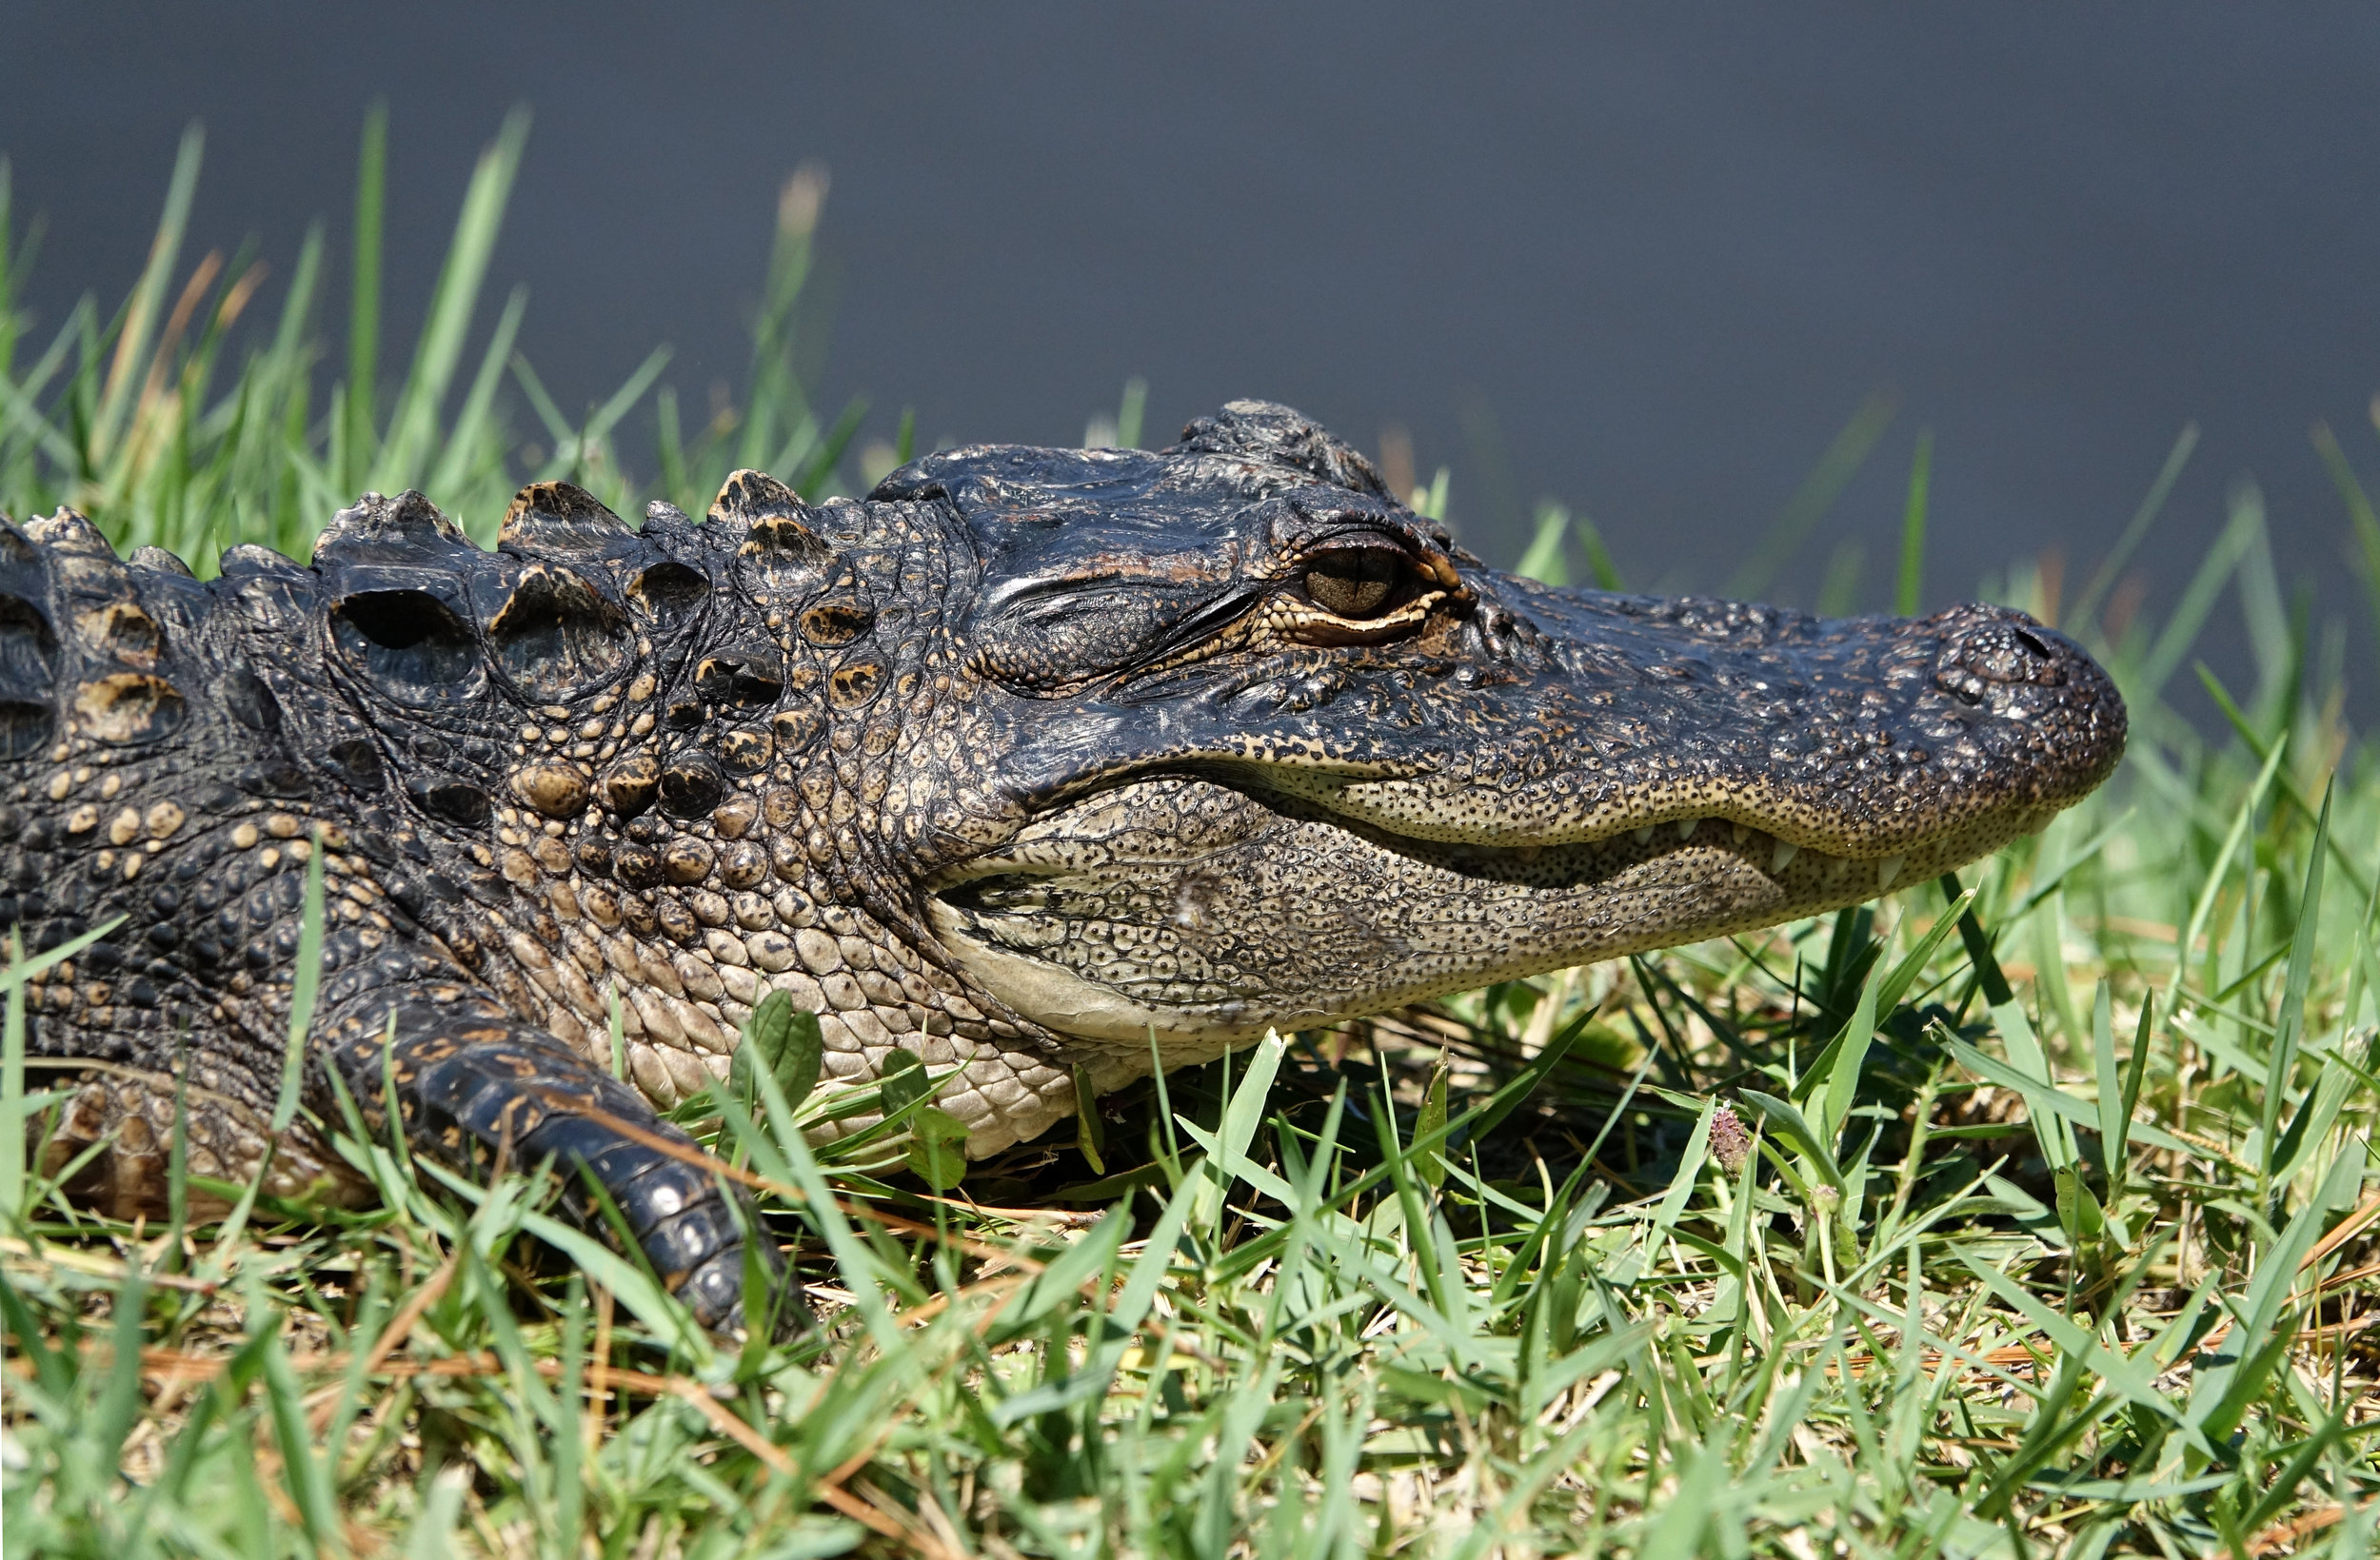 AMERICAN ALLIGATOR ( Alligator mississippiensis ), South Carolina, August 2017